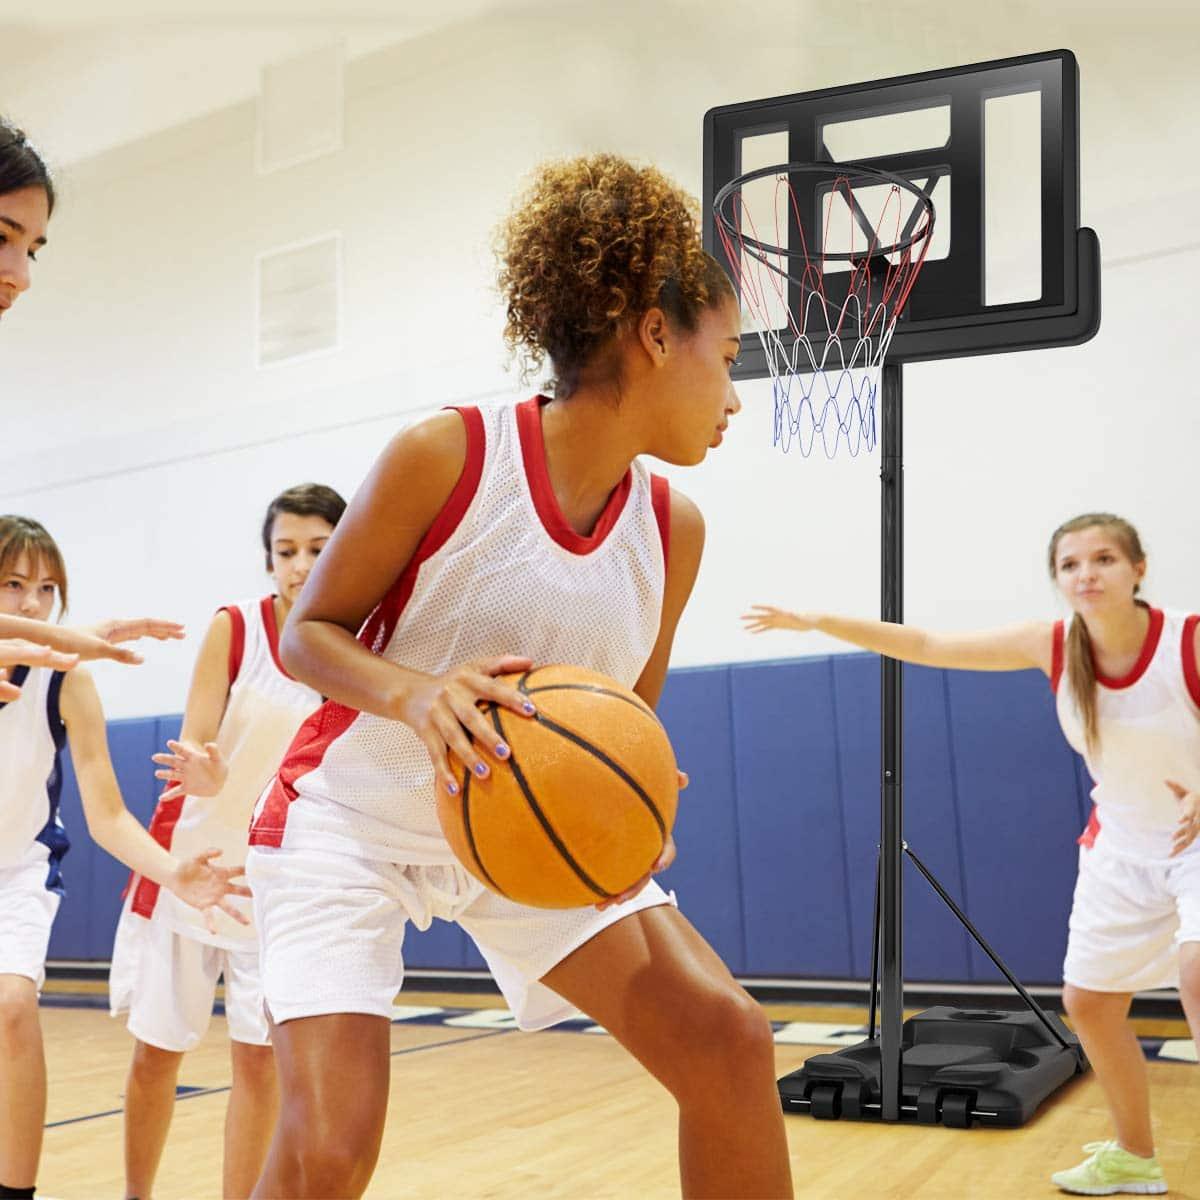 Top 10 Best Basketball Hoops in 2020 – Reviews & Buying Guide